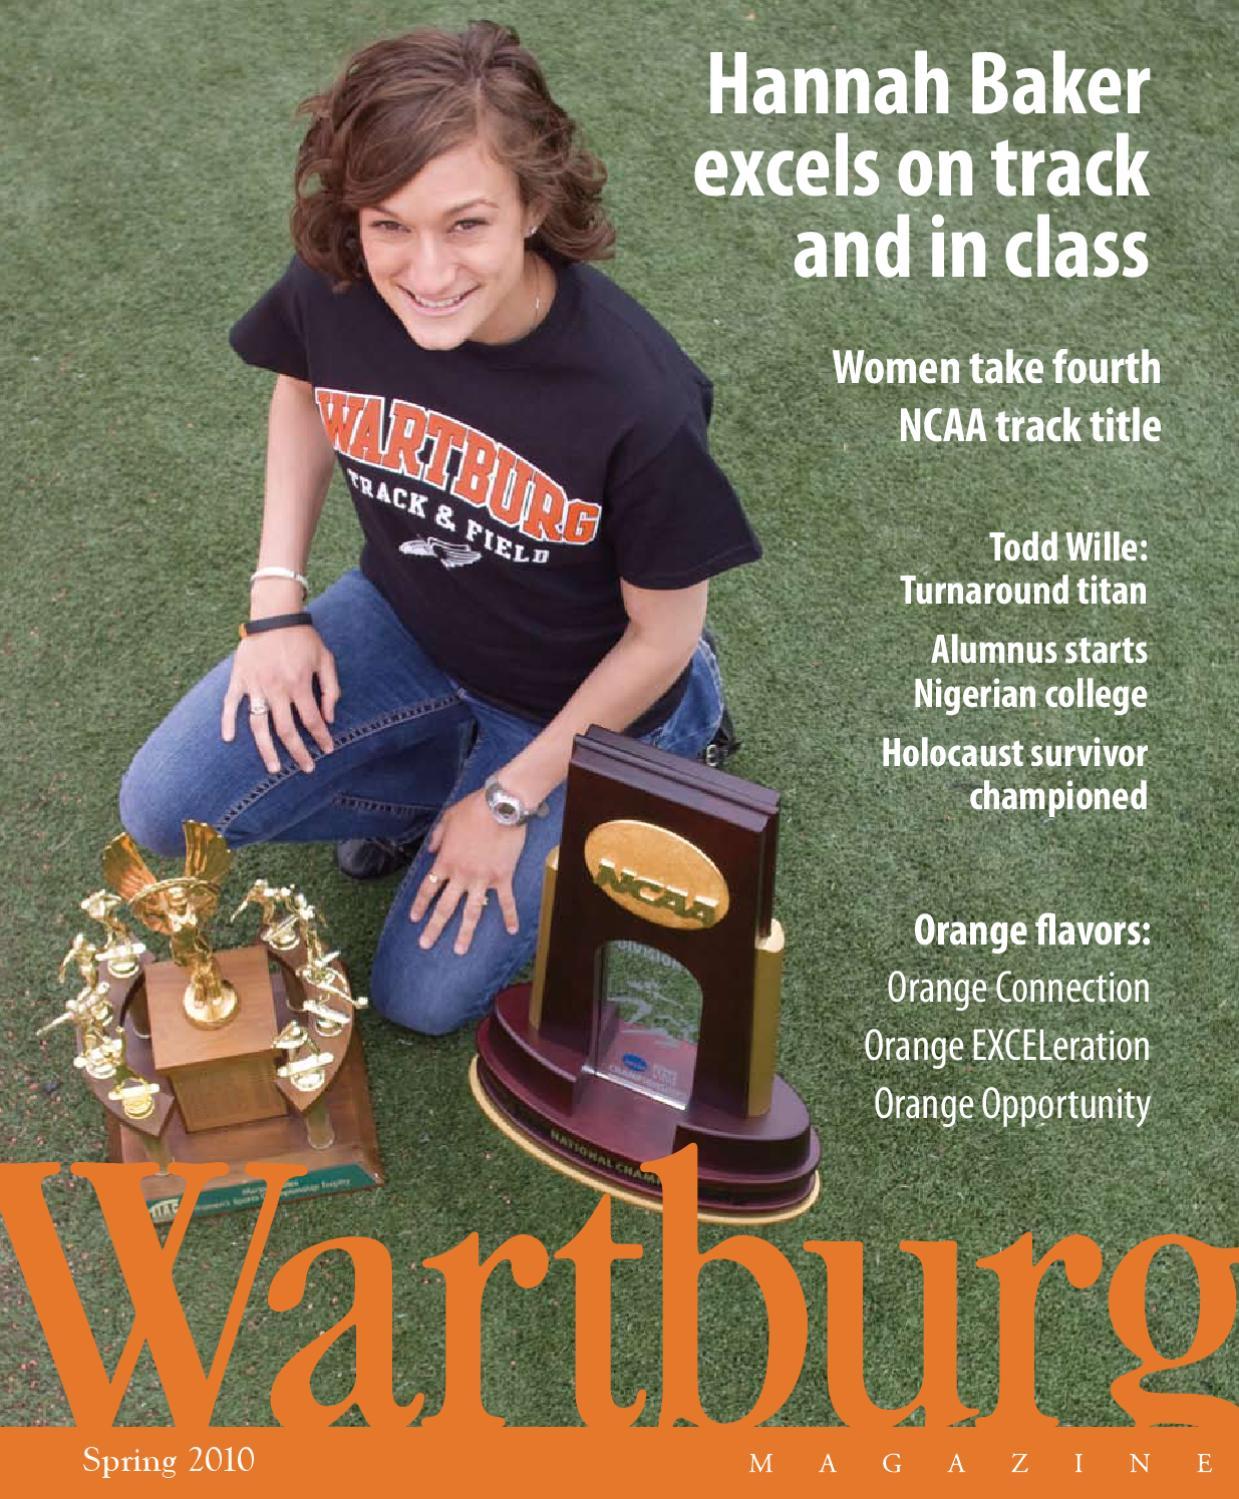 Spring 2010 Wartburg Magazine by Chris Knudson - issuu